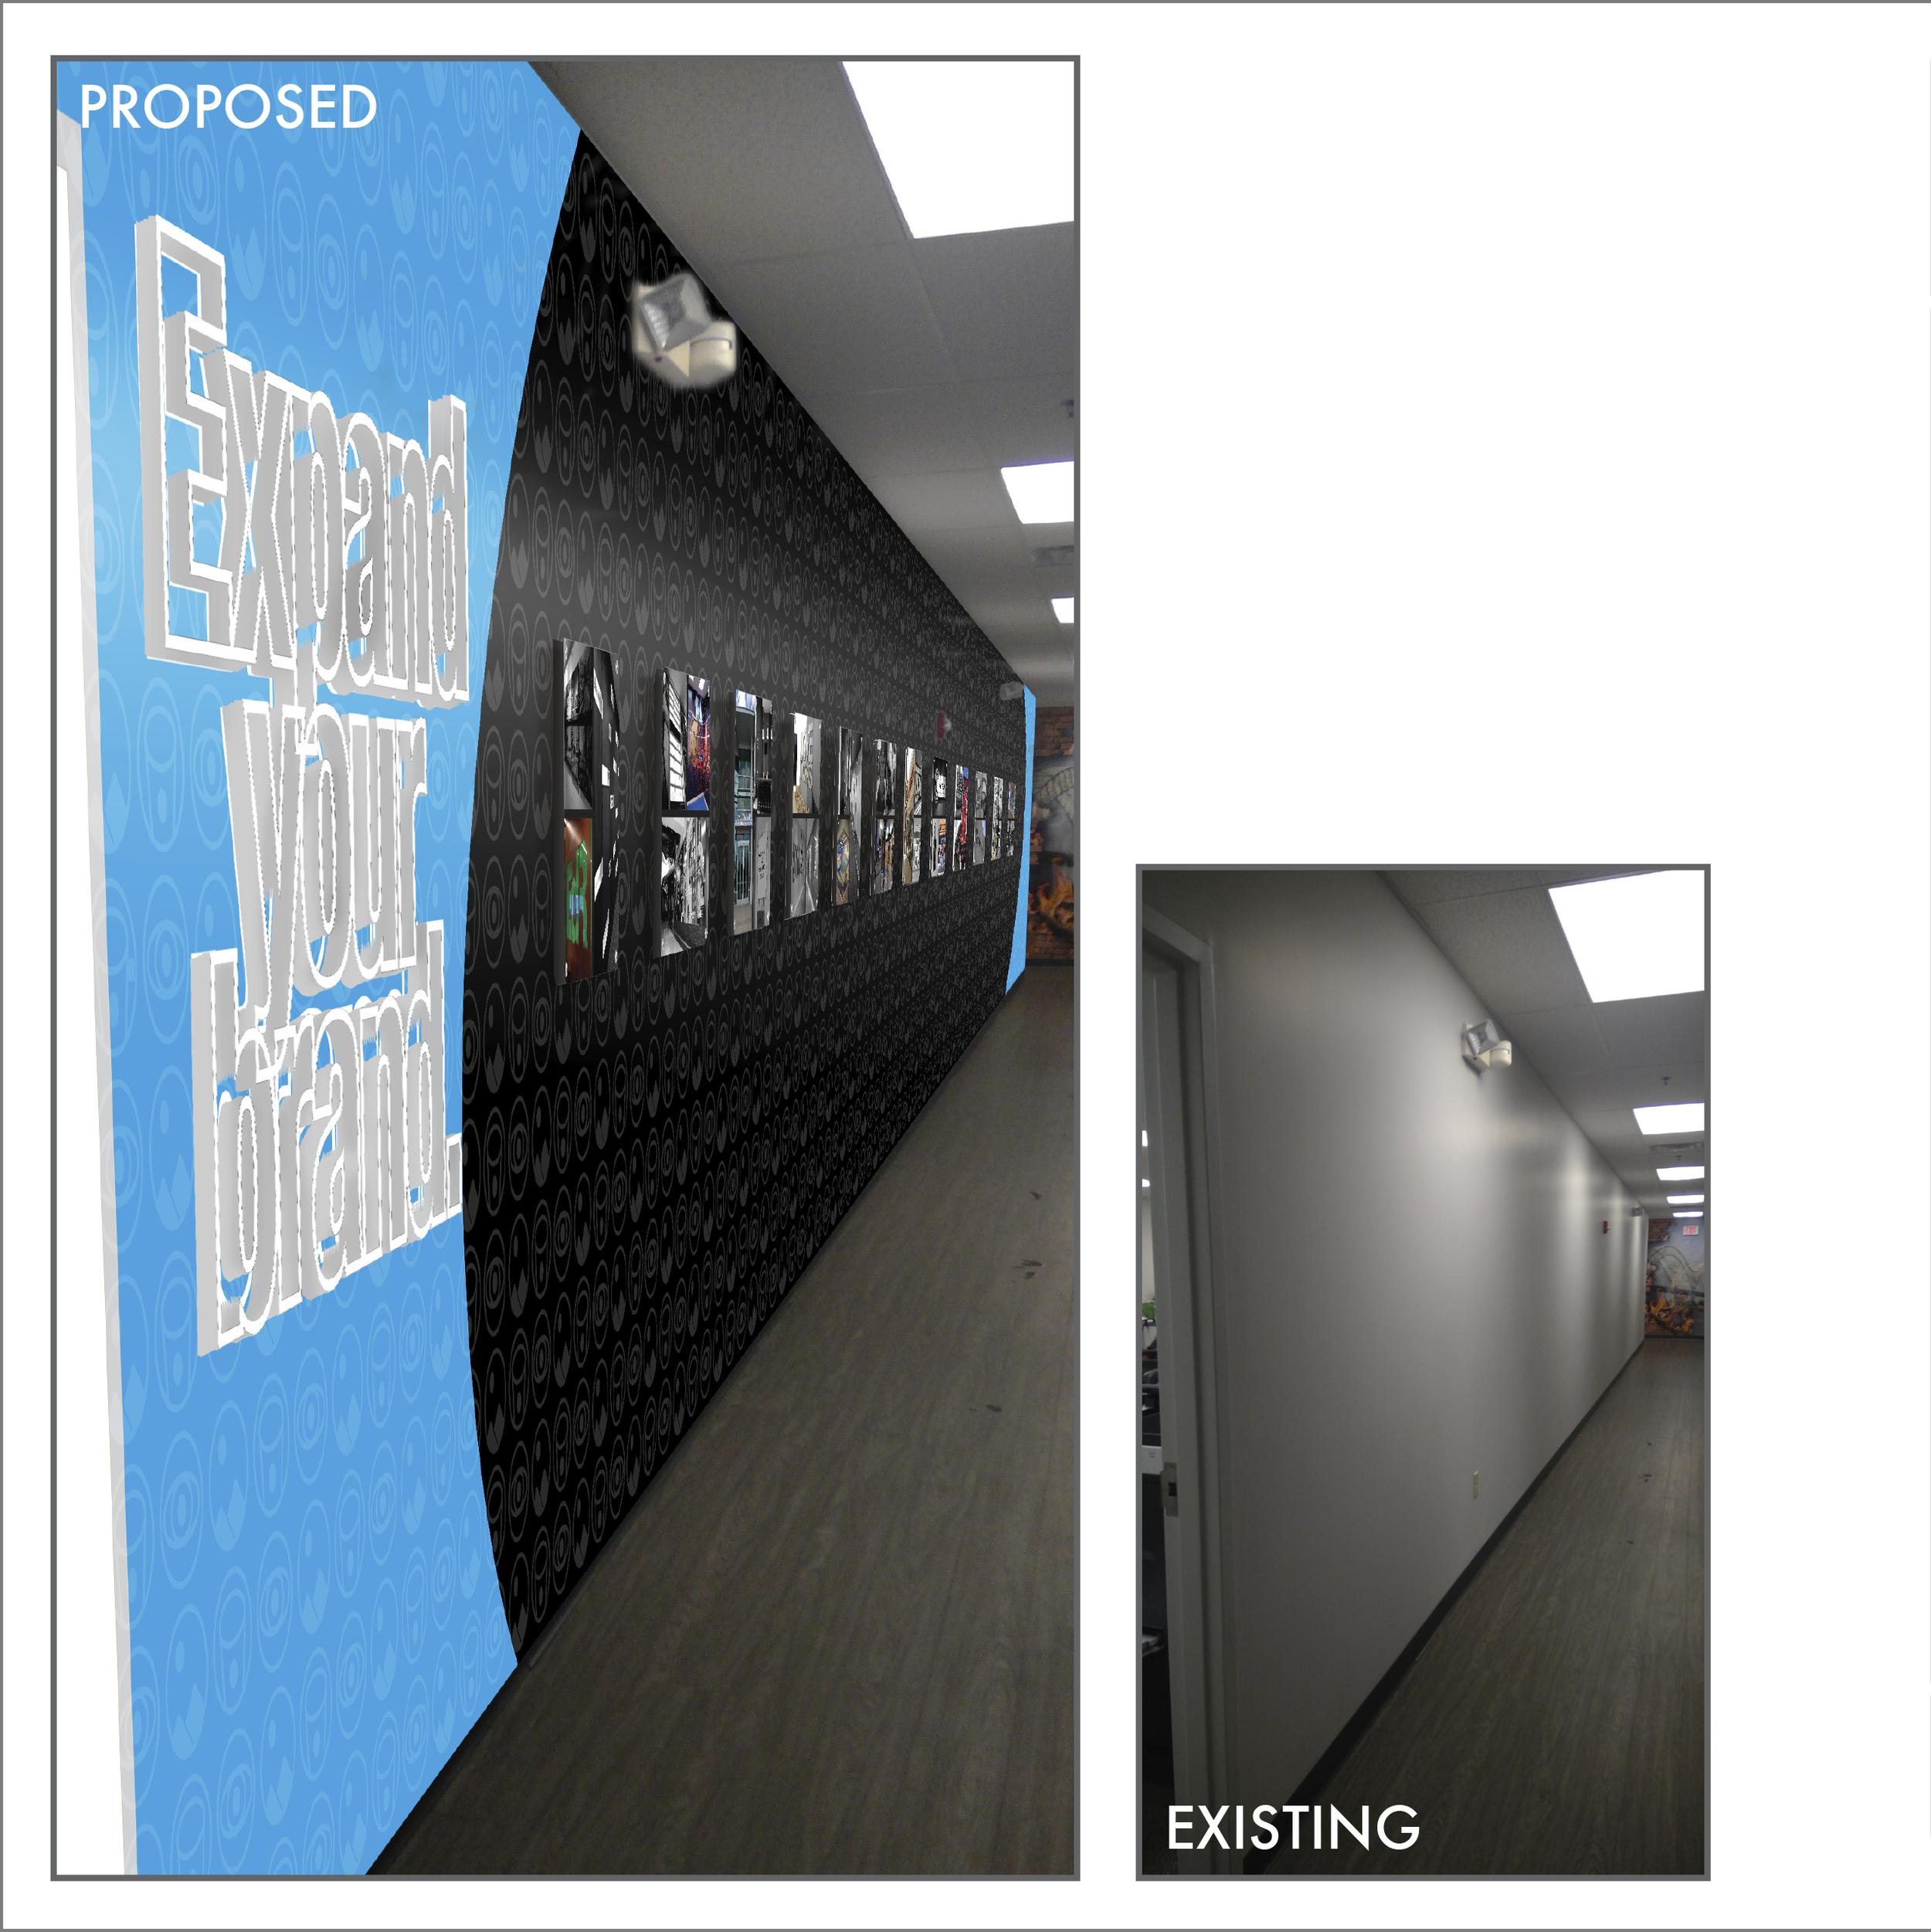 LSIGraphics_Environmental-Graphics_Expand-Your-Brand-Wall_Horizontal-Lockup_Dreamcapture_Memphis-TN_5